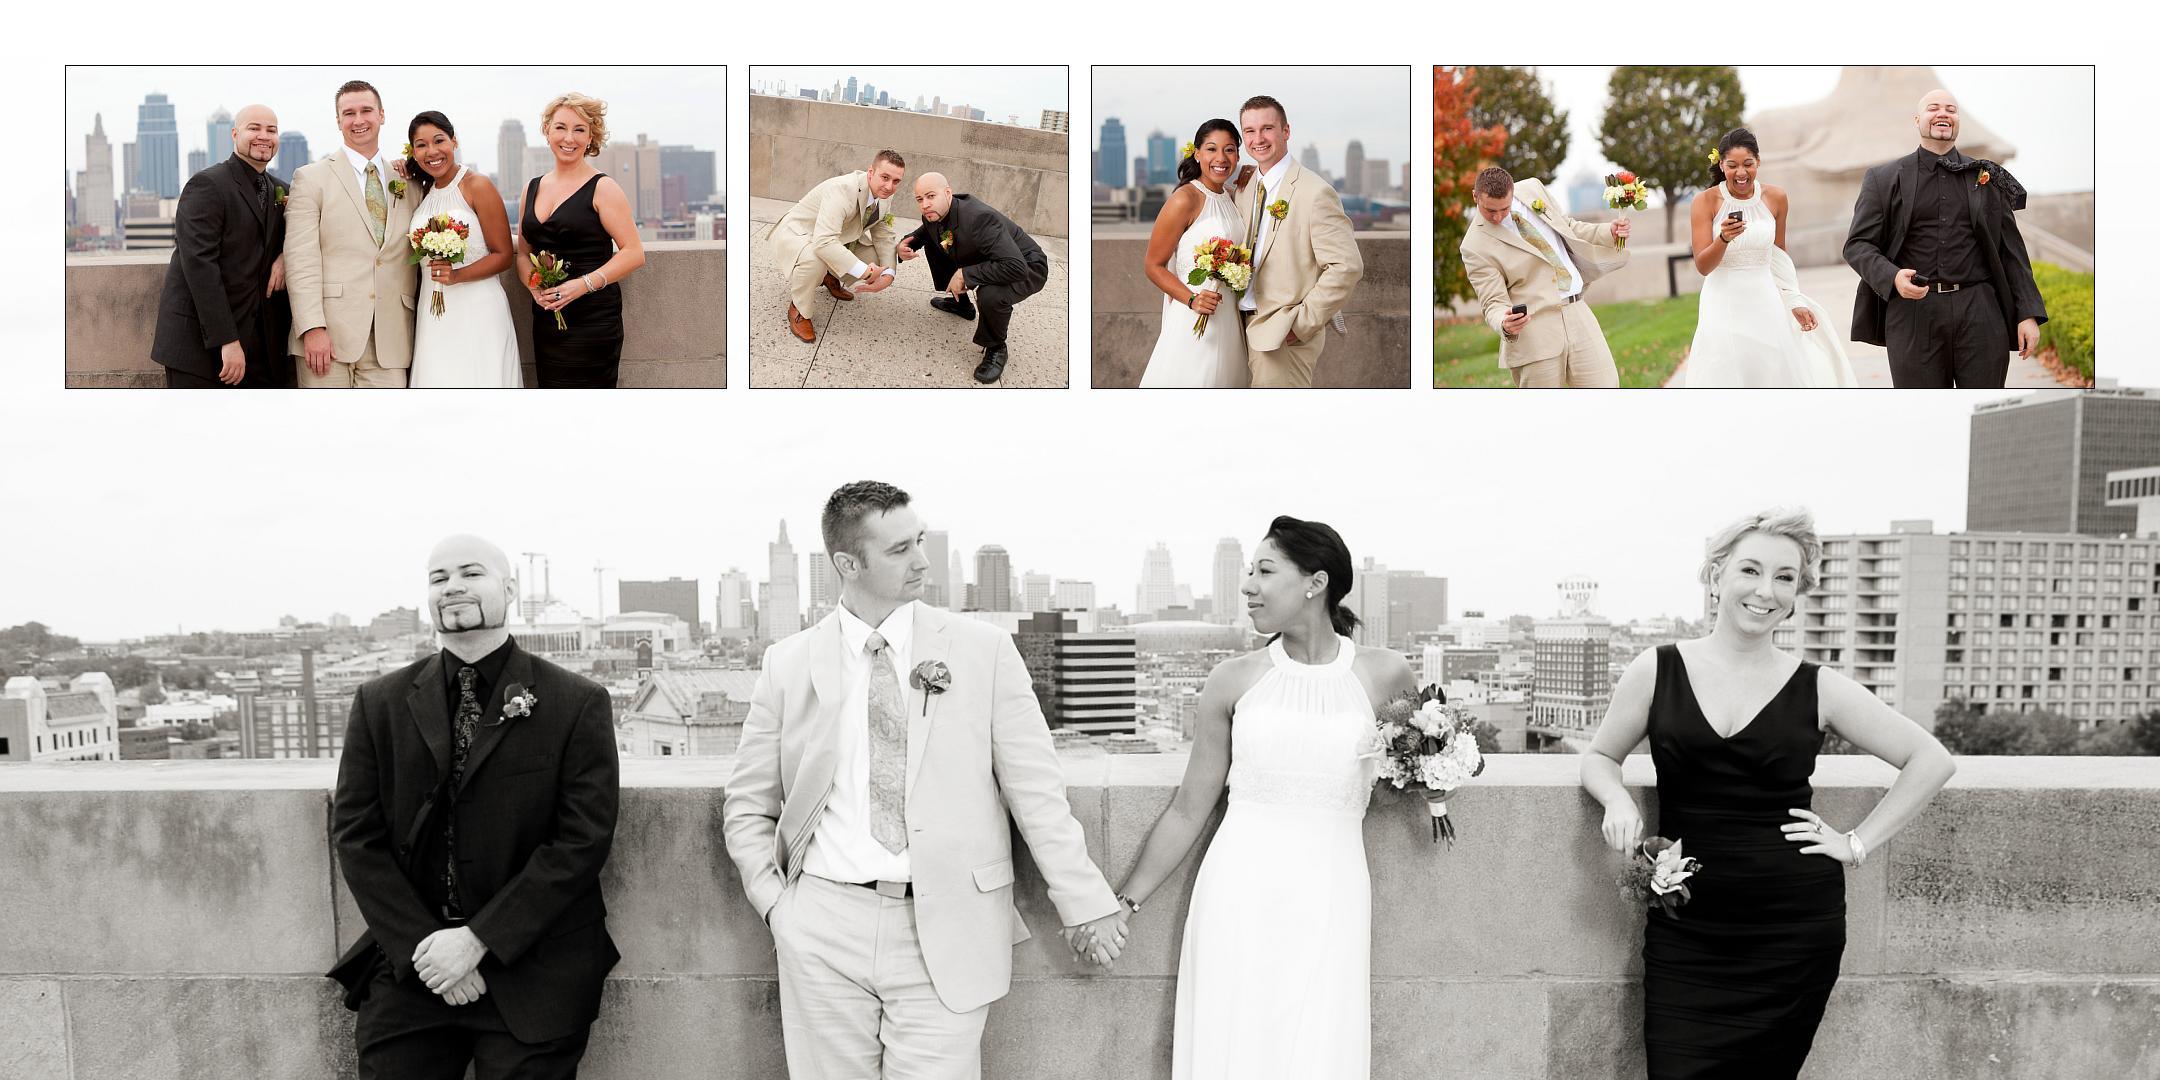 Wedding Photos by Tom Schmidt Chicago (32)